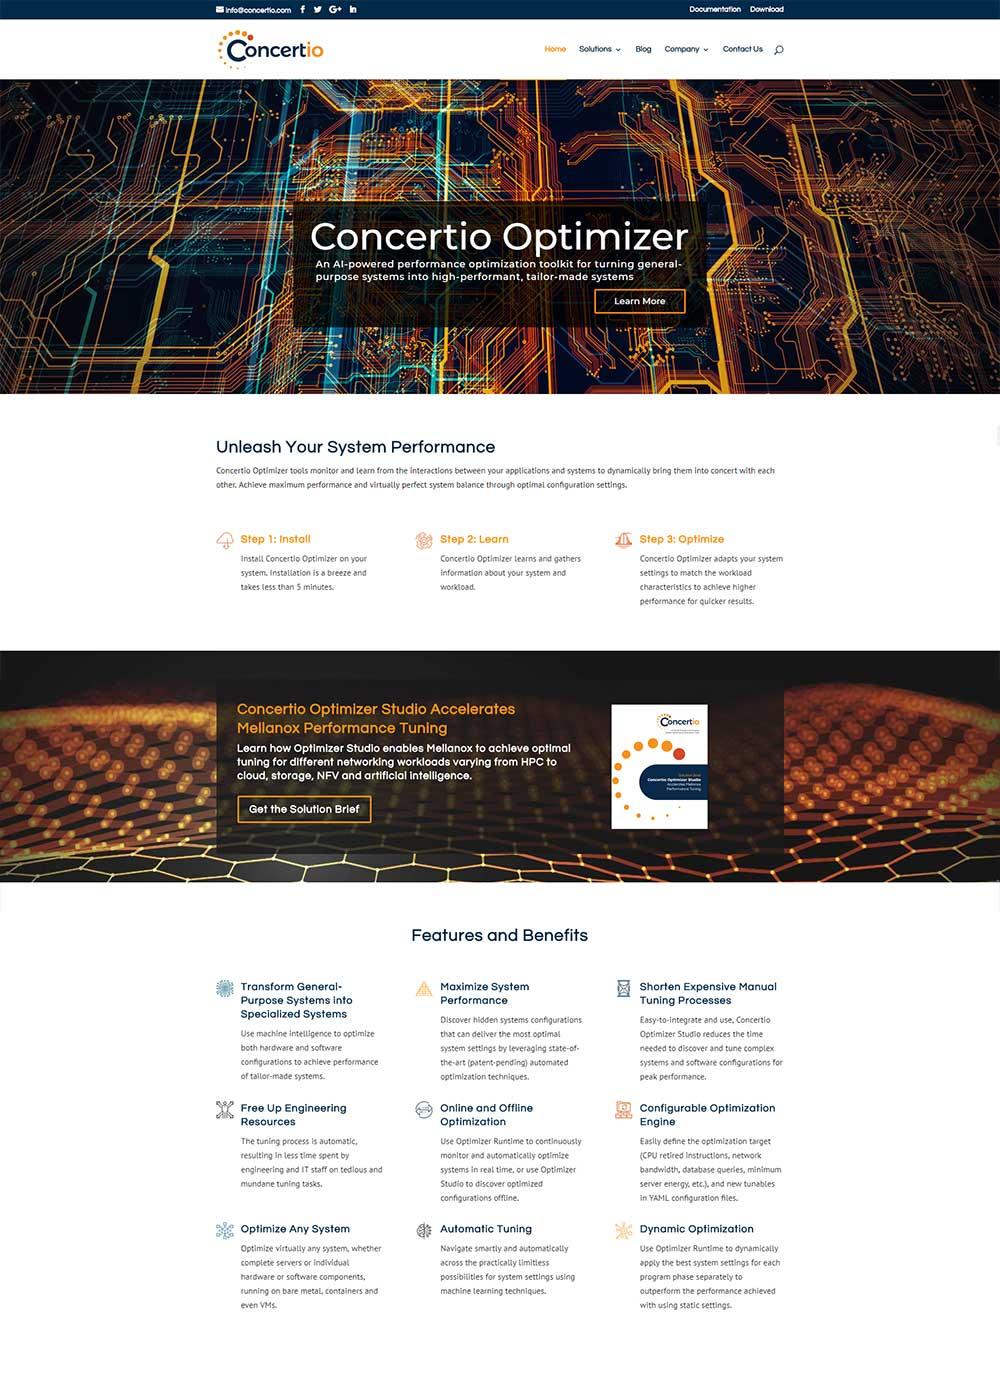 Concertio homepage